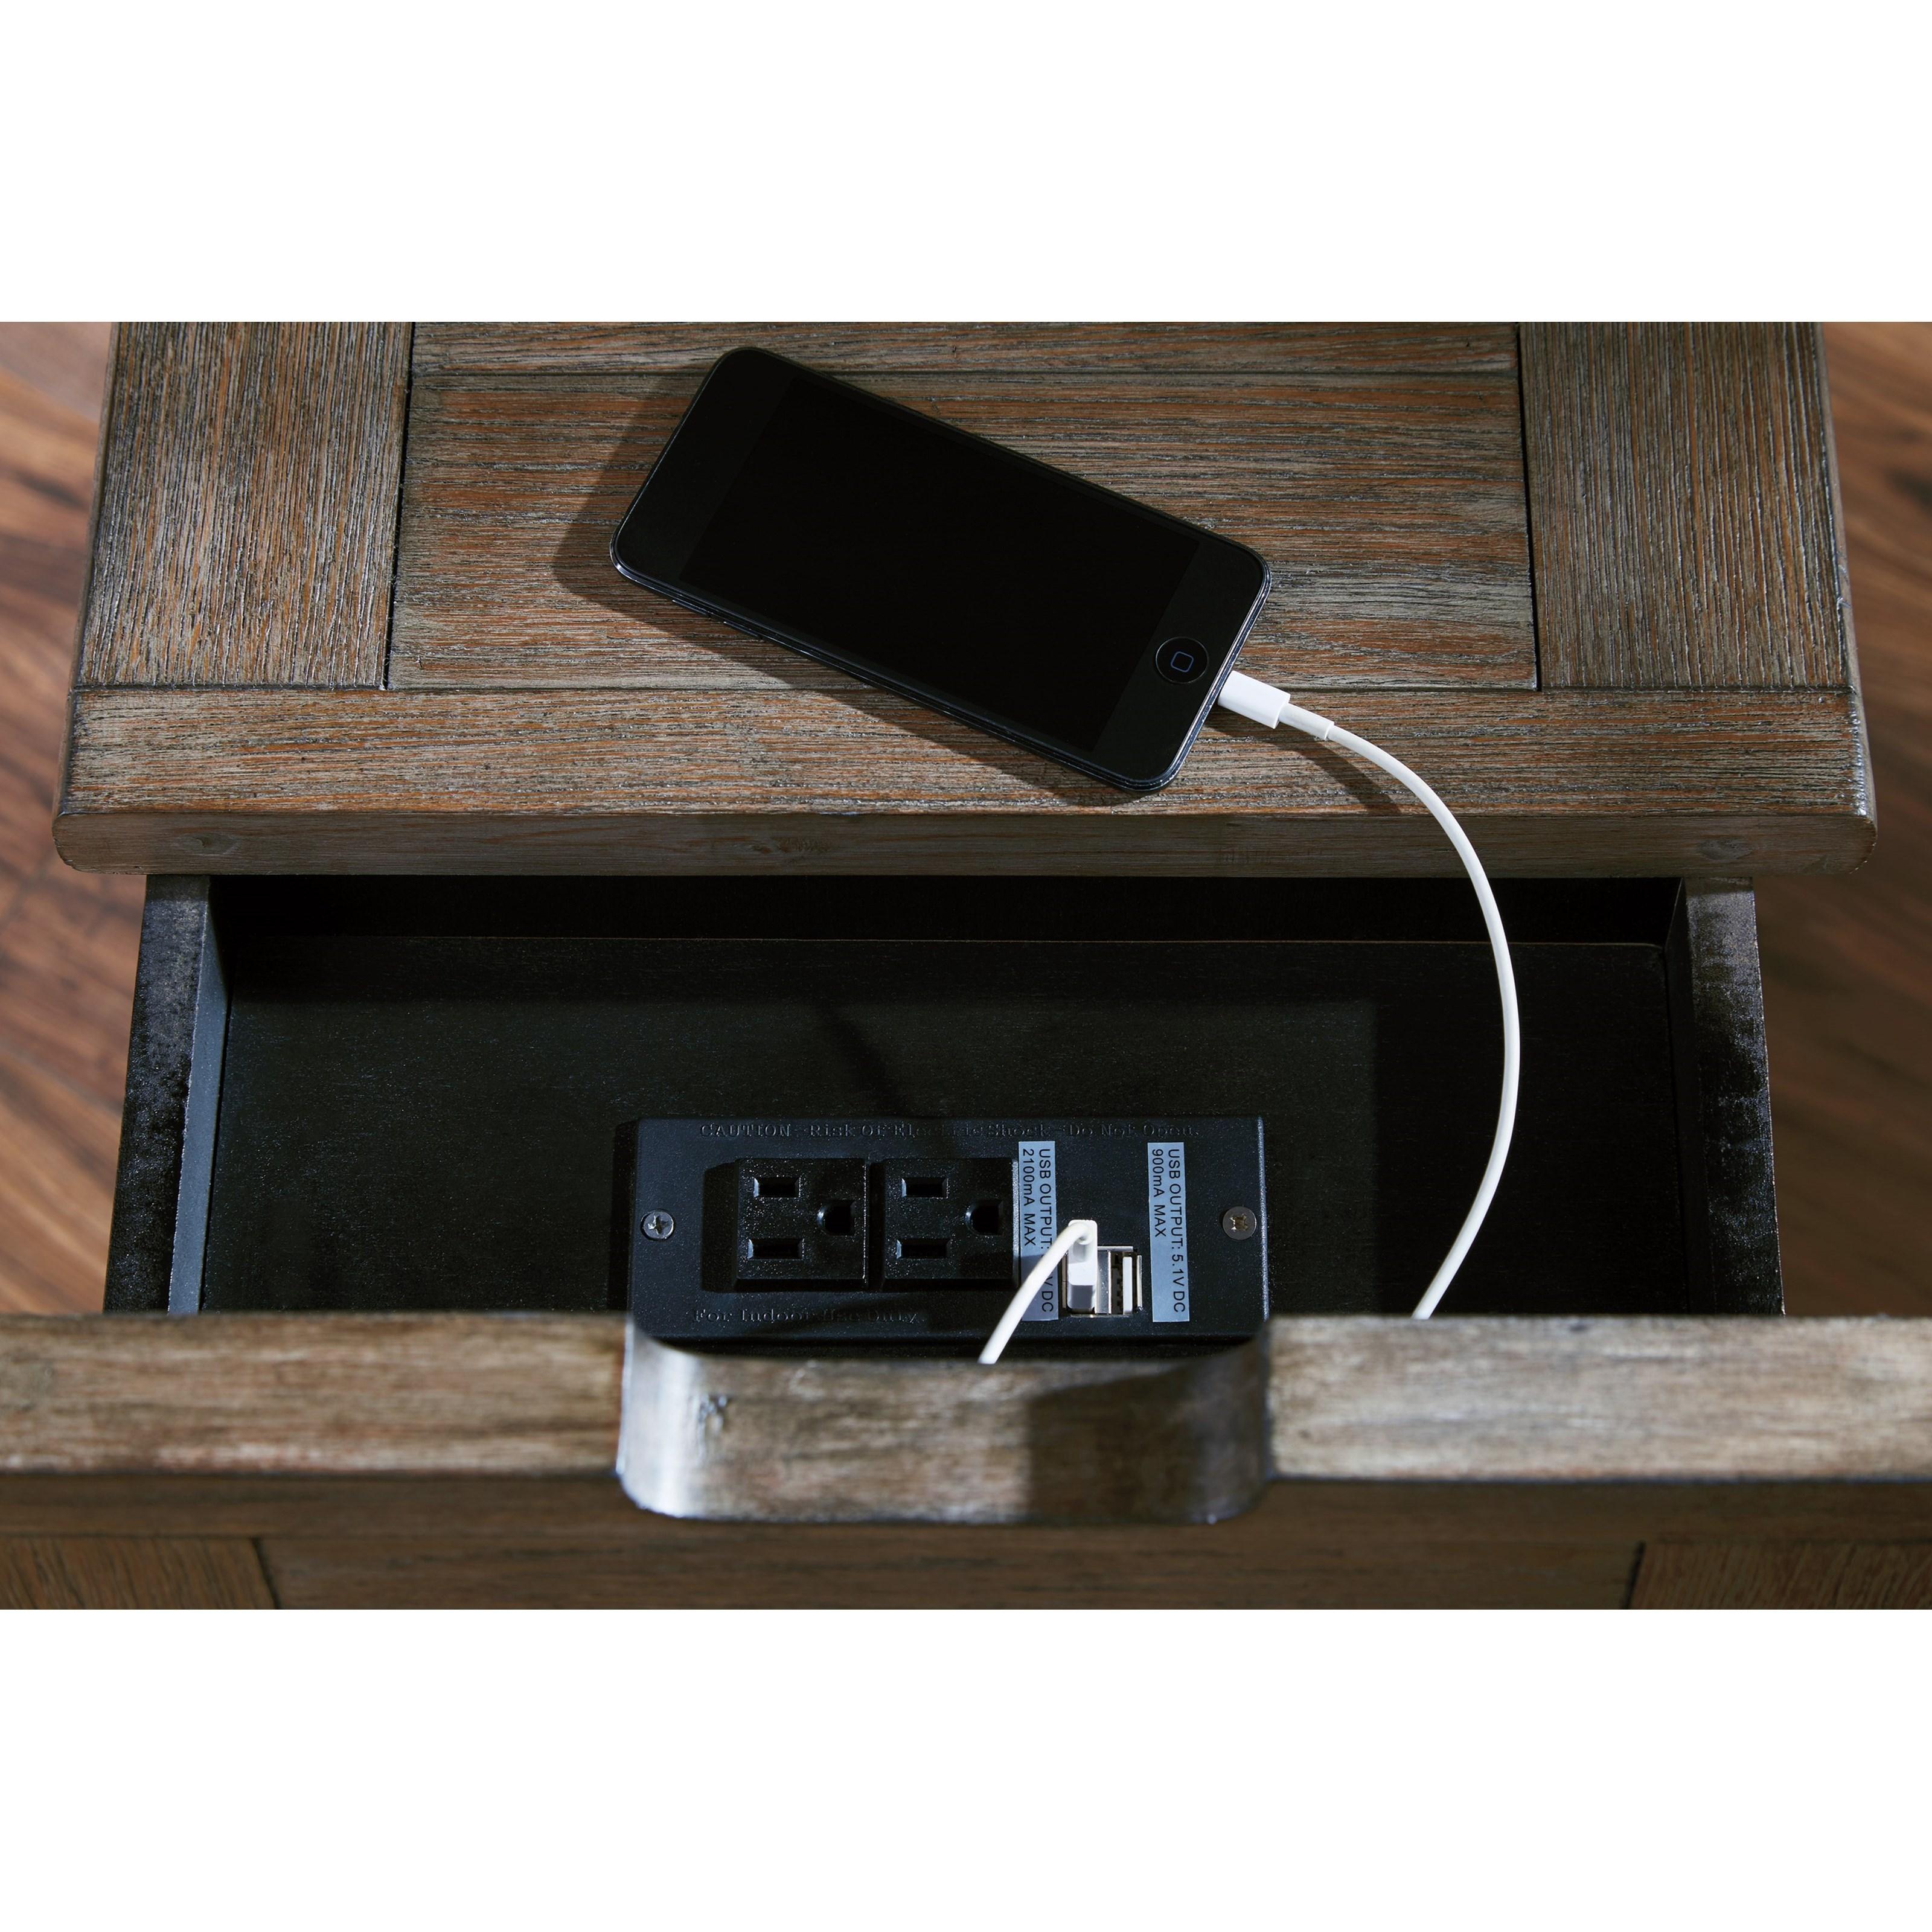 styleline klaus t736 7 chair side end table with outlet and usb ports efo furniture outlet. Black Bedroom Furniture Sets. Home Design Ideas